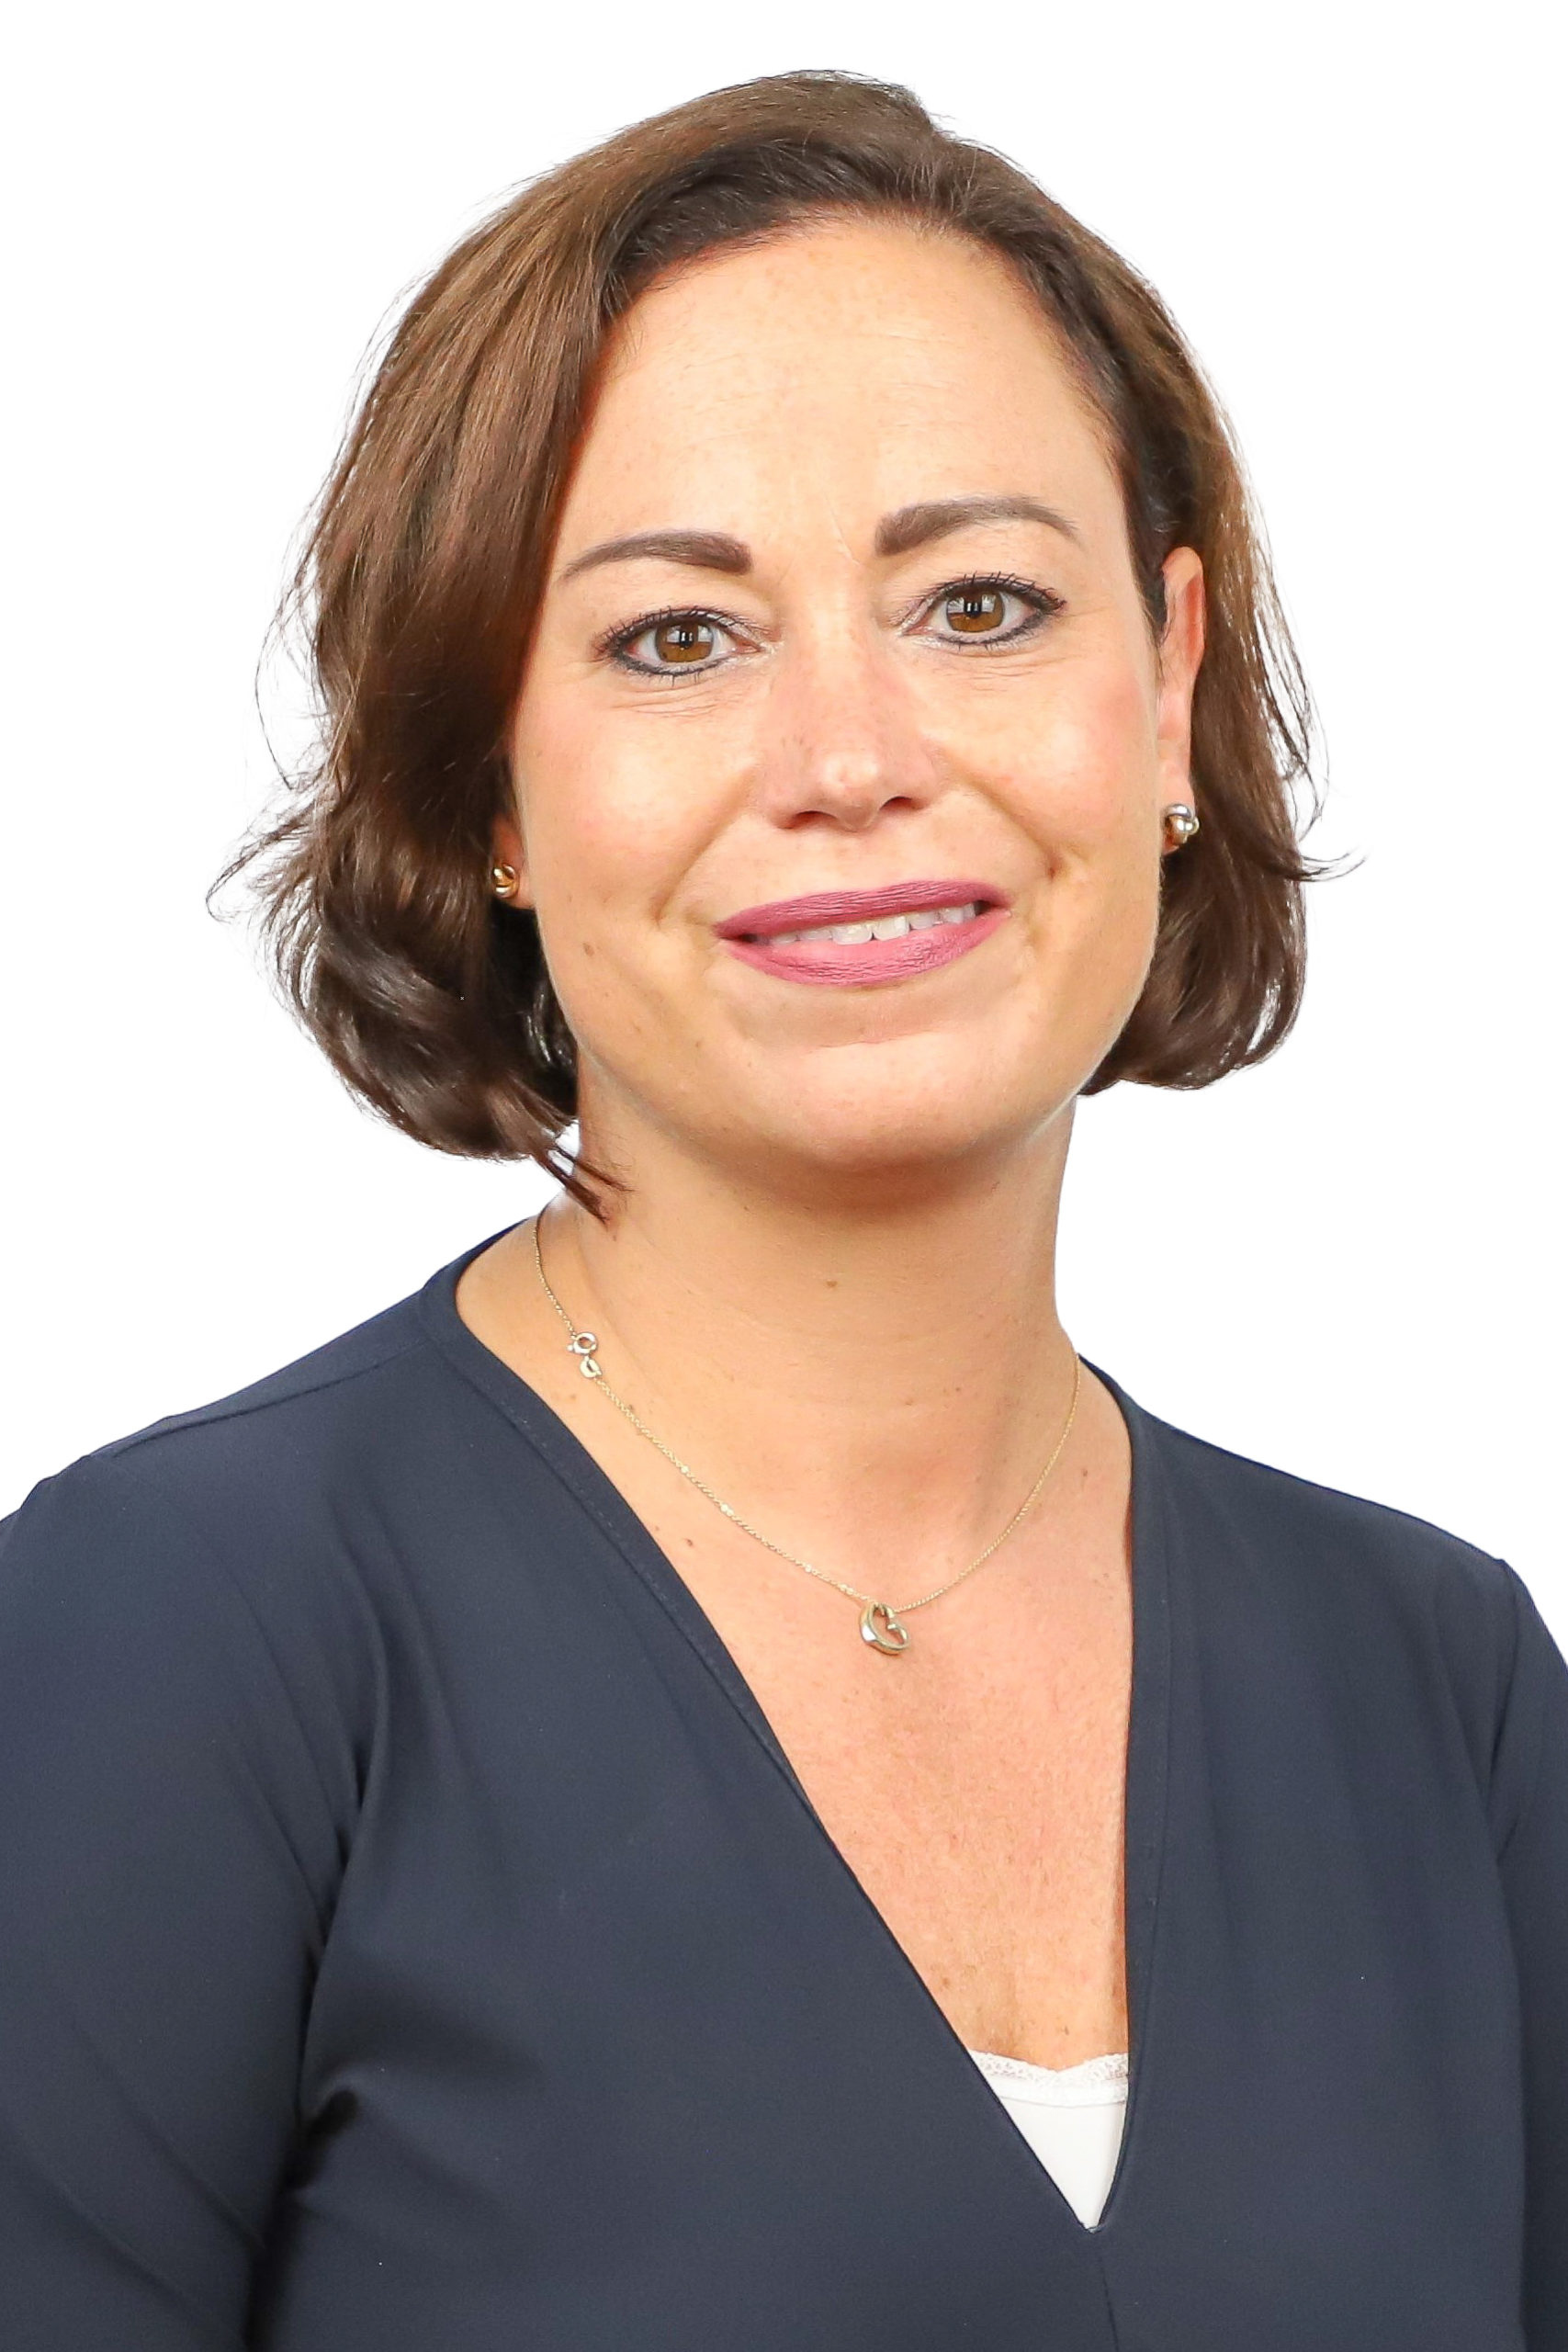 Claudia Benders